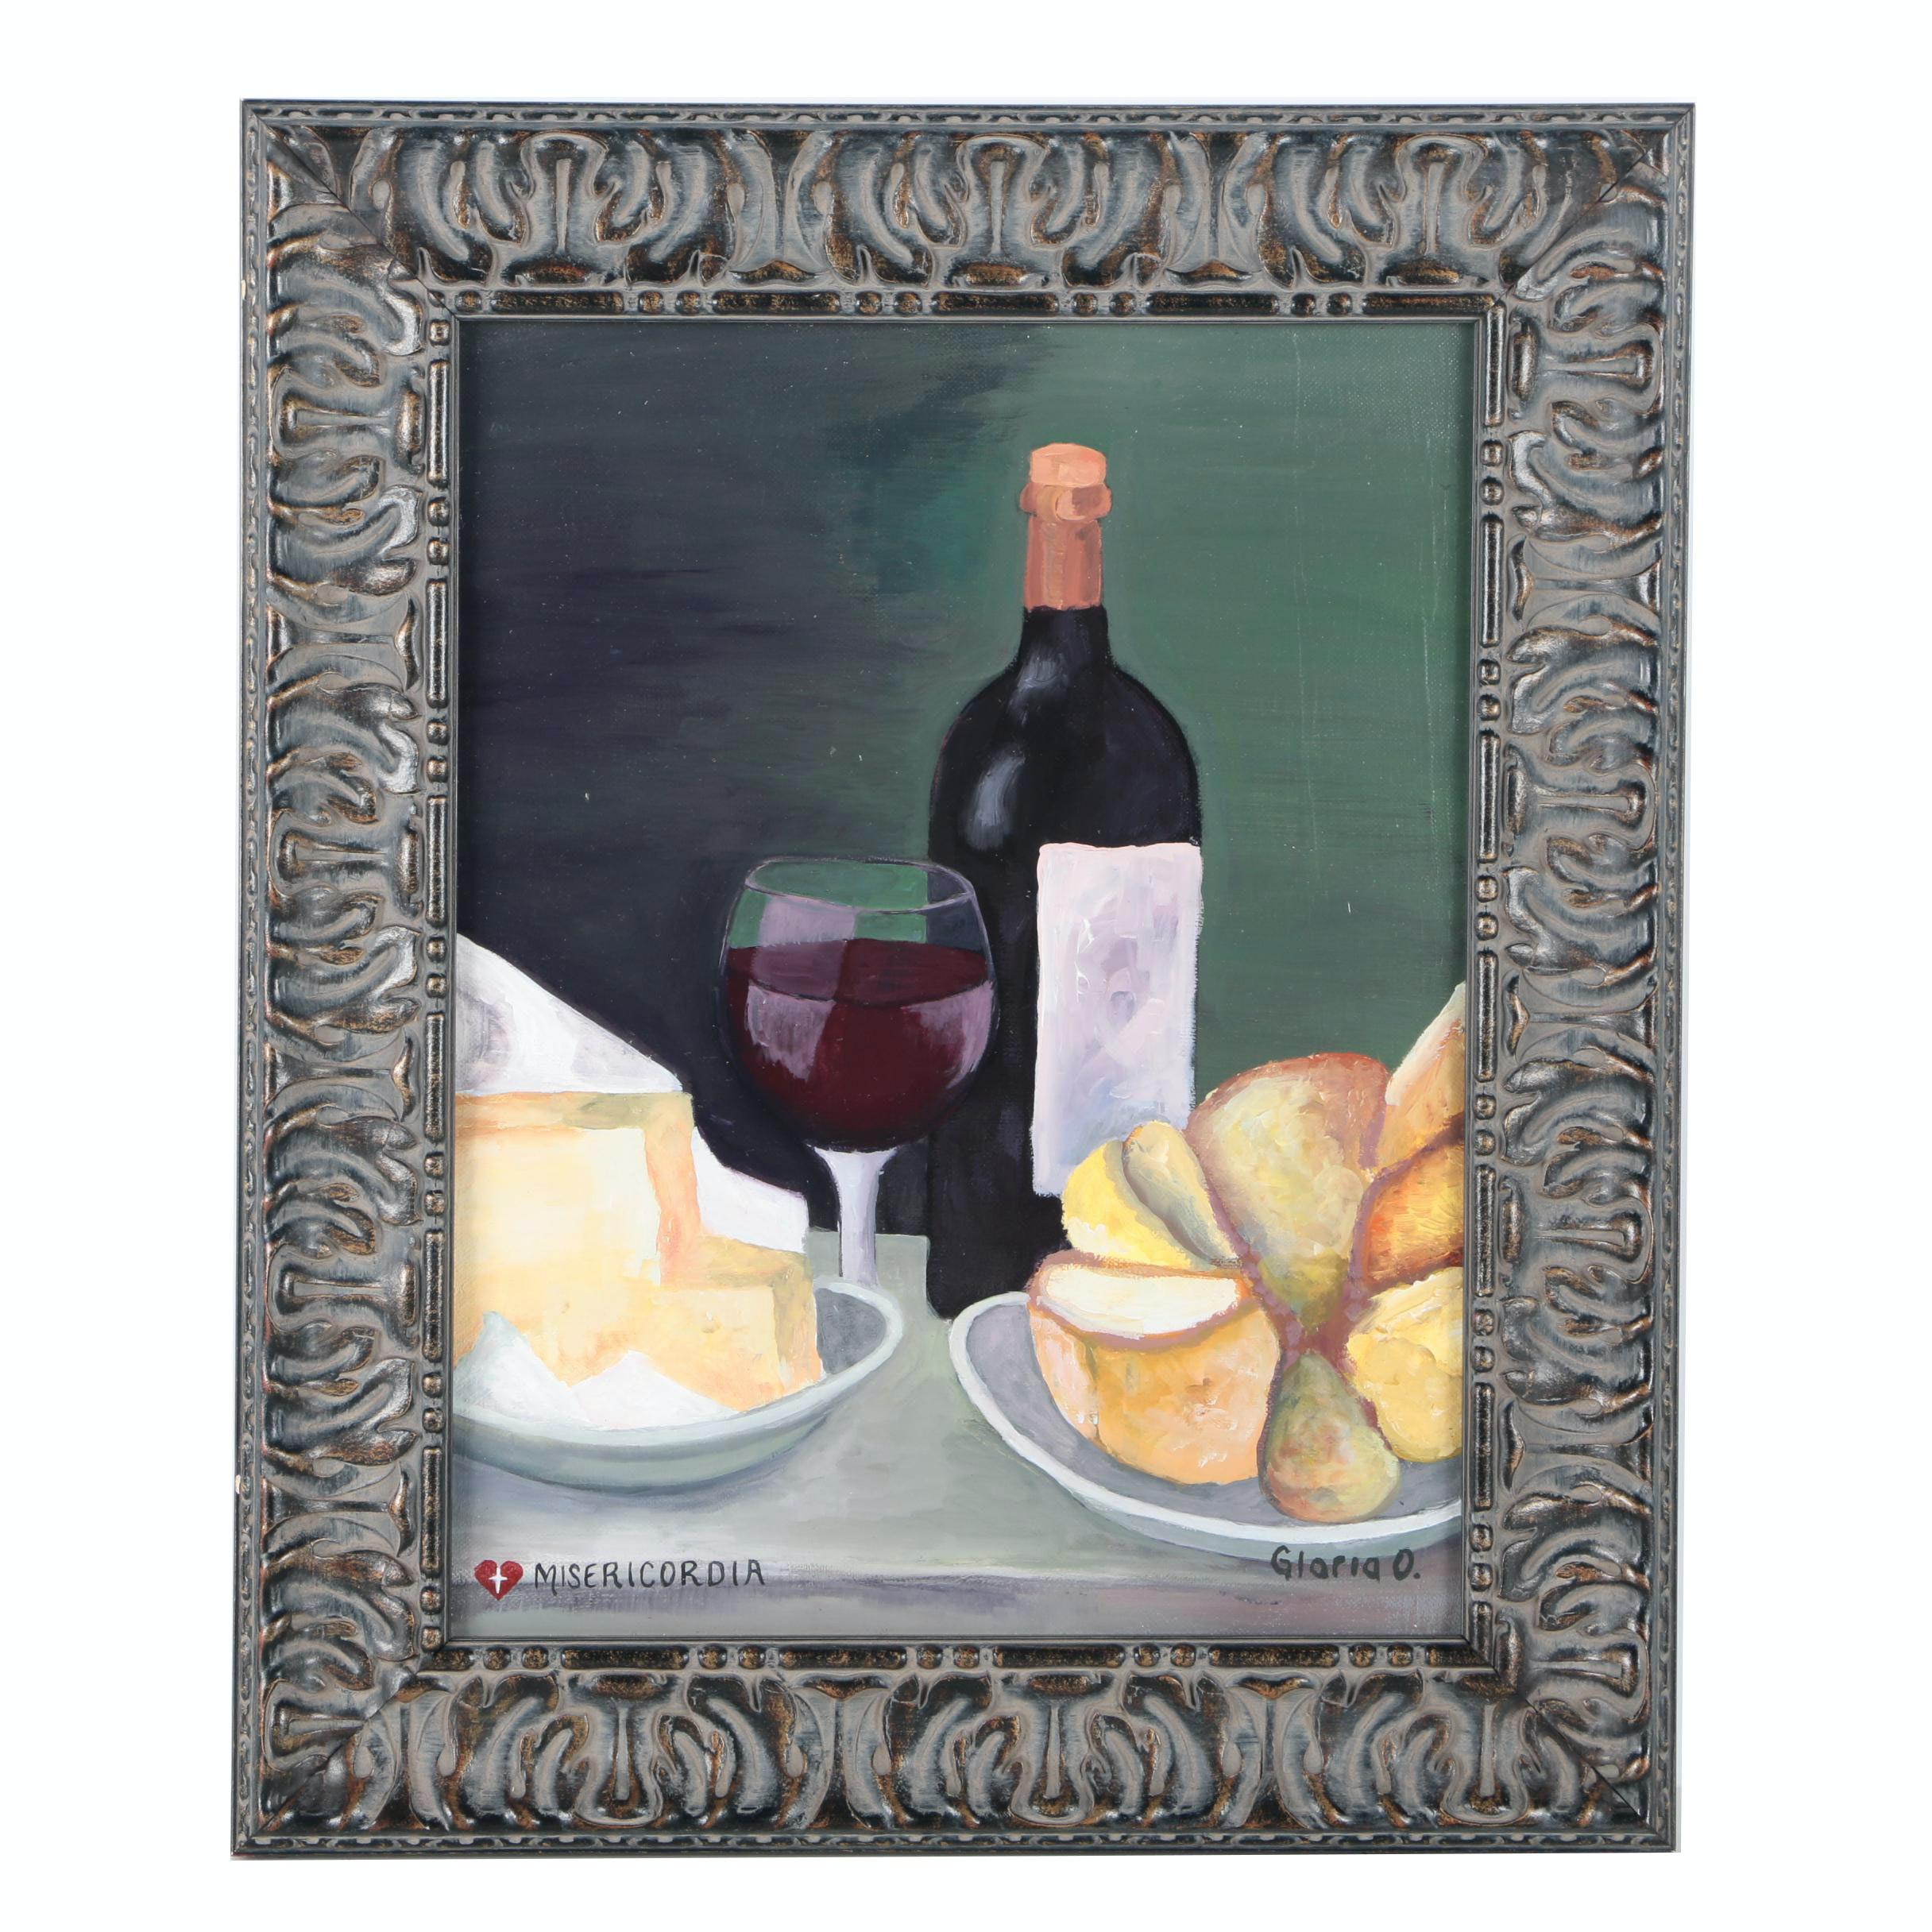 "Gloria O. Oil Still Life Painting ""Misericordia"""